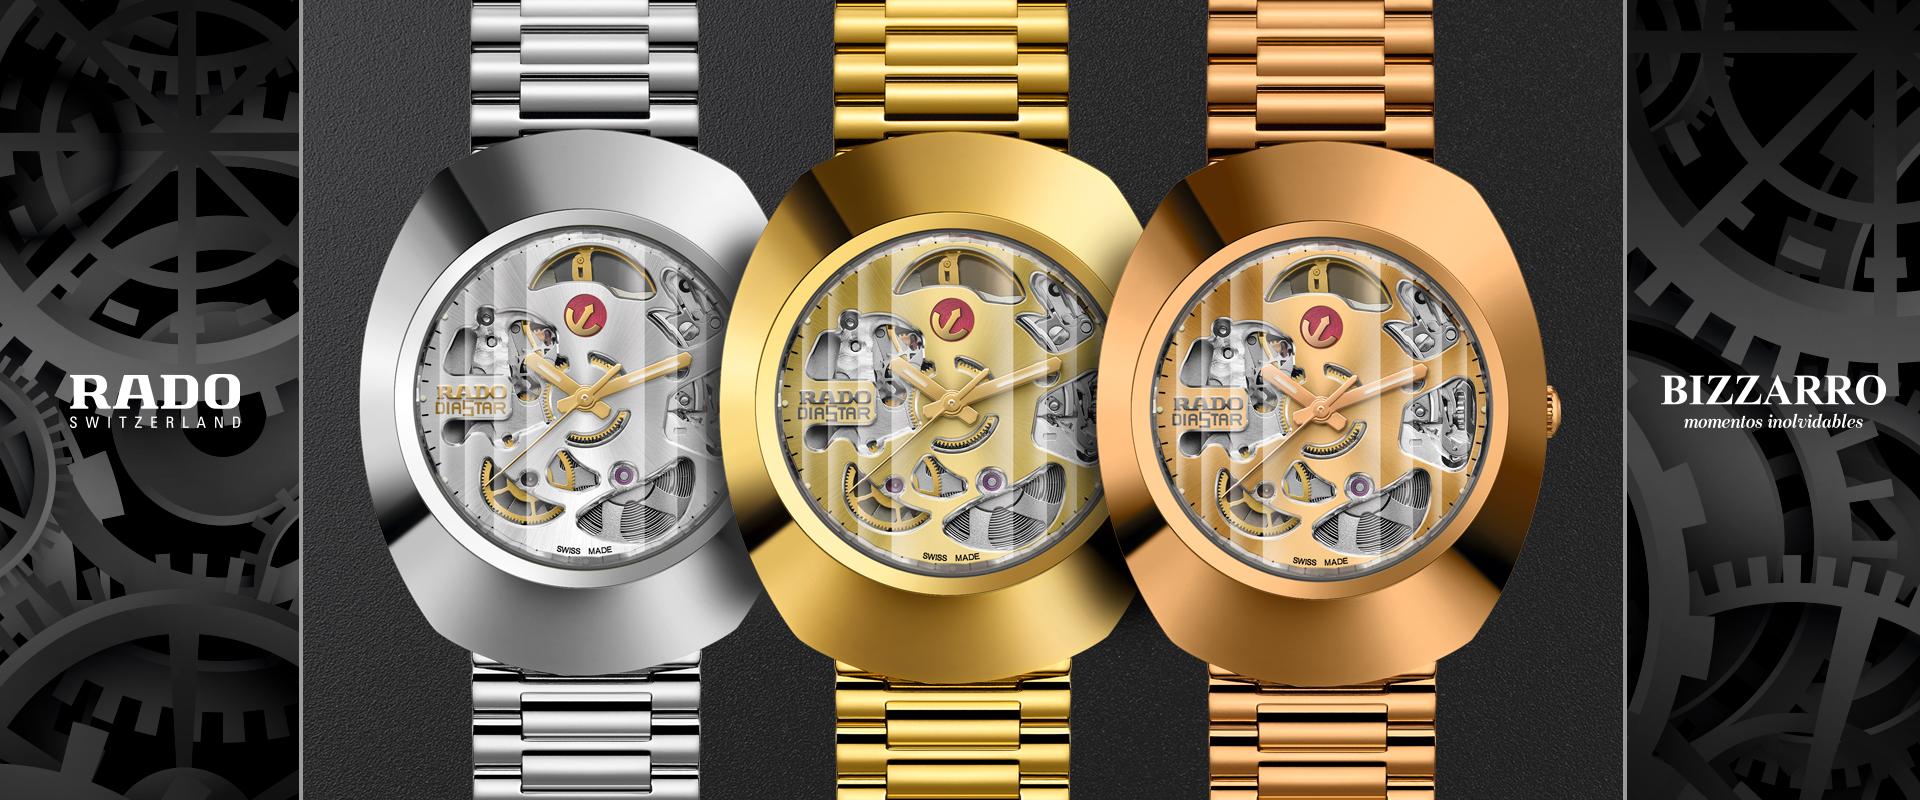 RADO revela relojes con maquinaria que